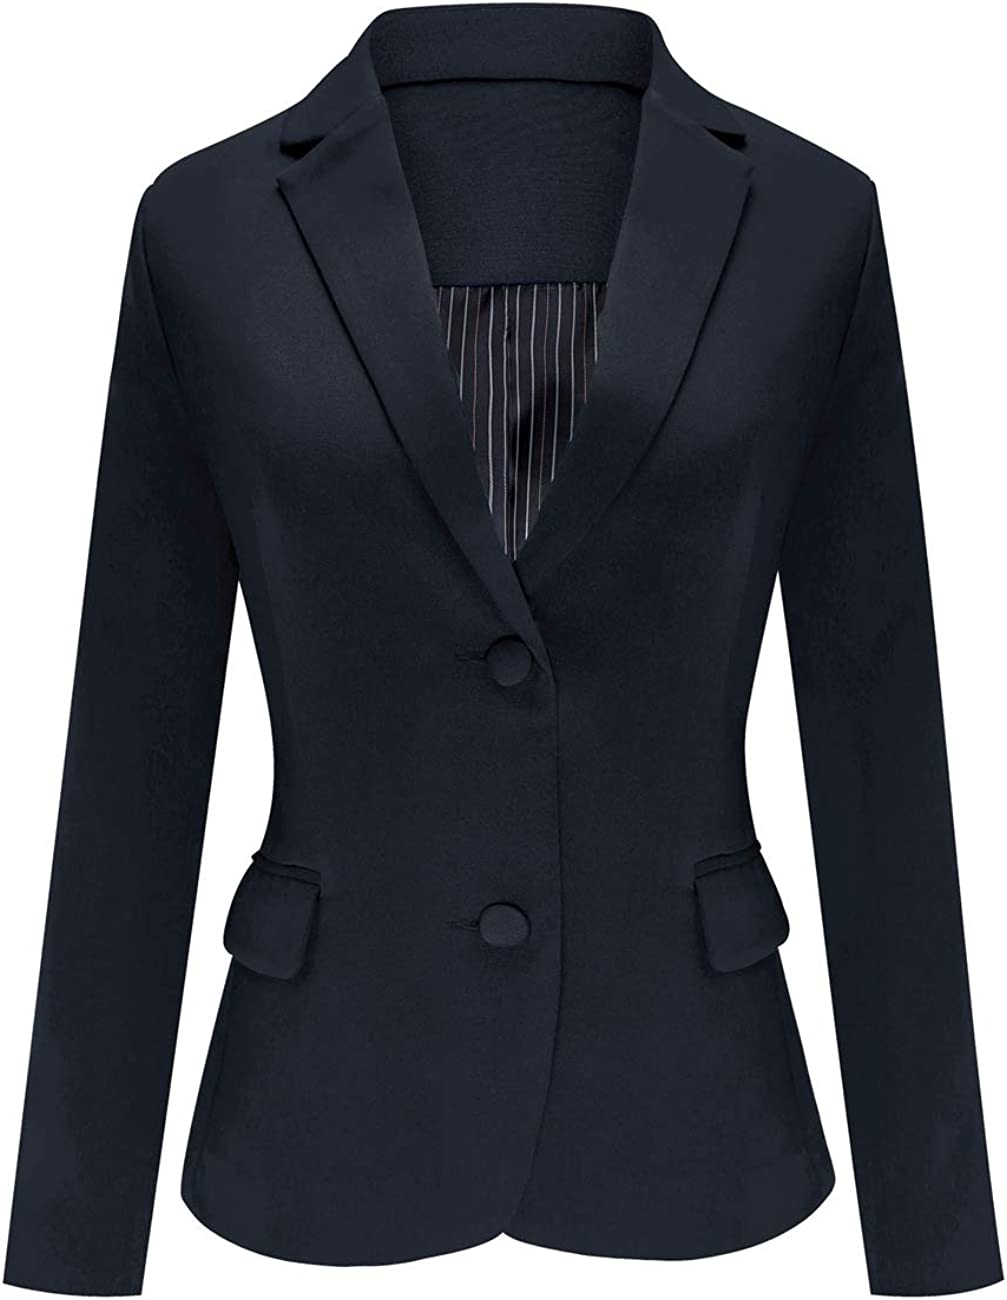 Luyeess Women's Casual Work Office Notch Lapel Pocket Buttons Blazer Suit Jacket